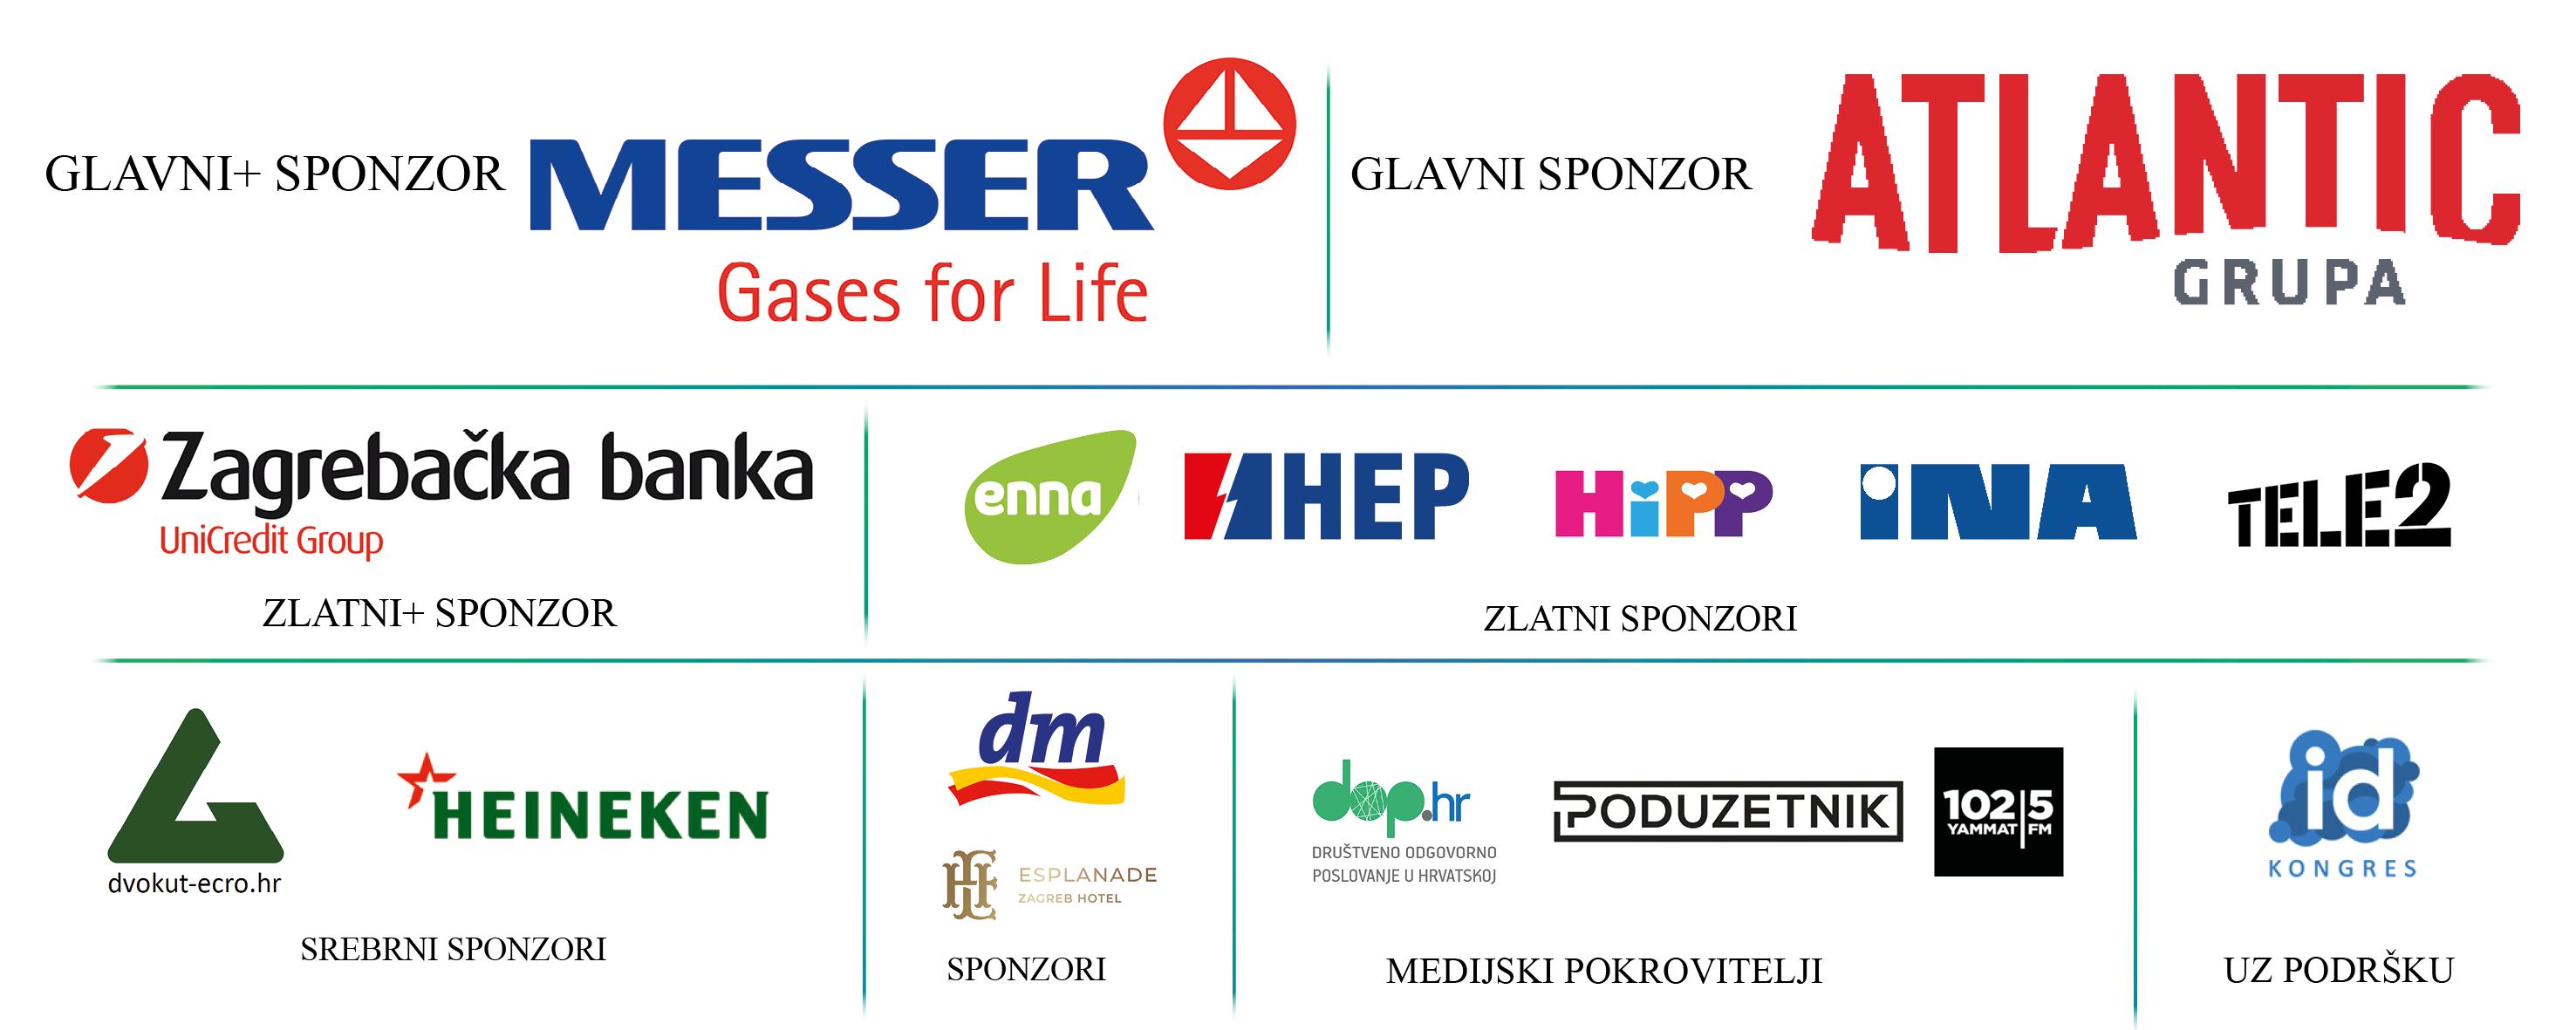 12. konferencija o DOP-u i 13. dodjela nagrada Indeksa DOP-a 9 - hrpsor Hrvatski poslovni savjet za održivi razvoj